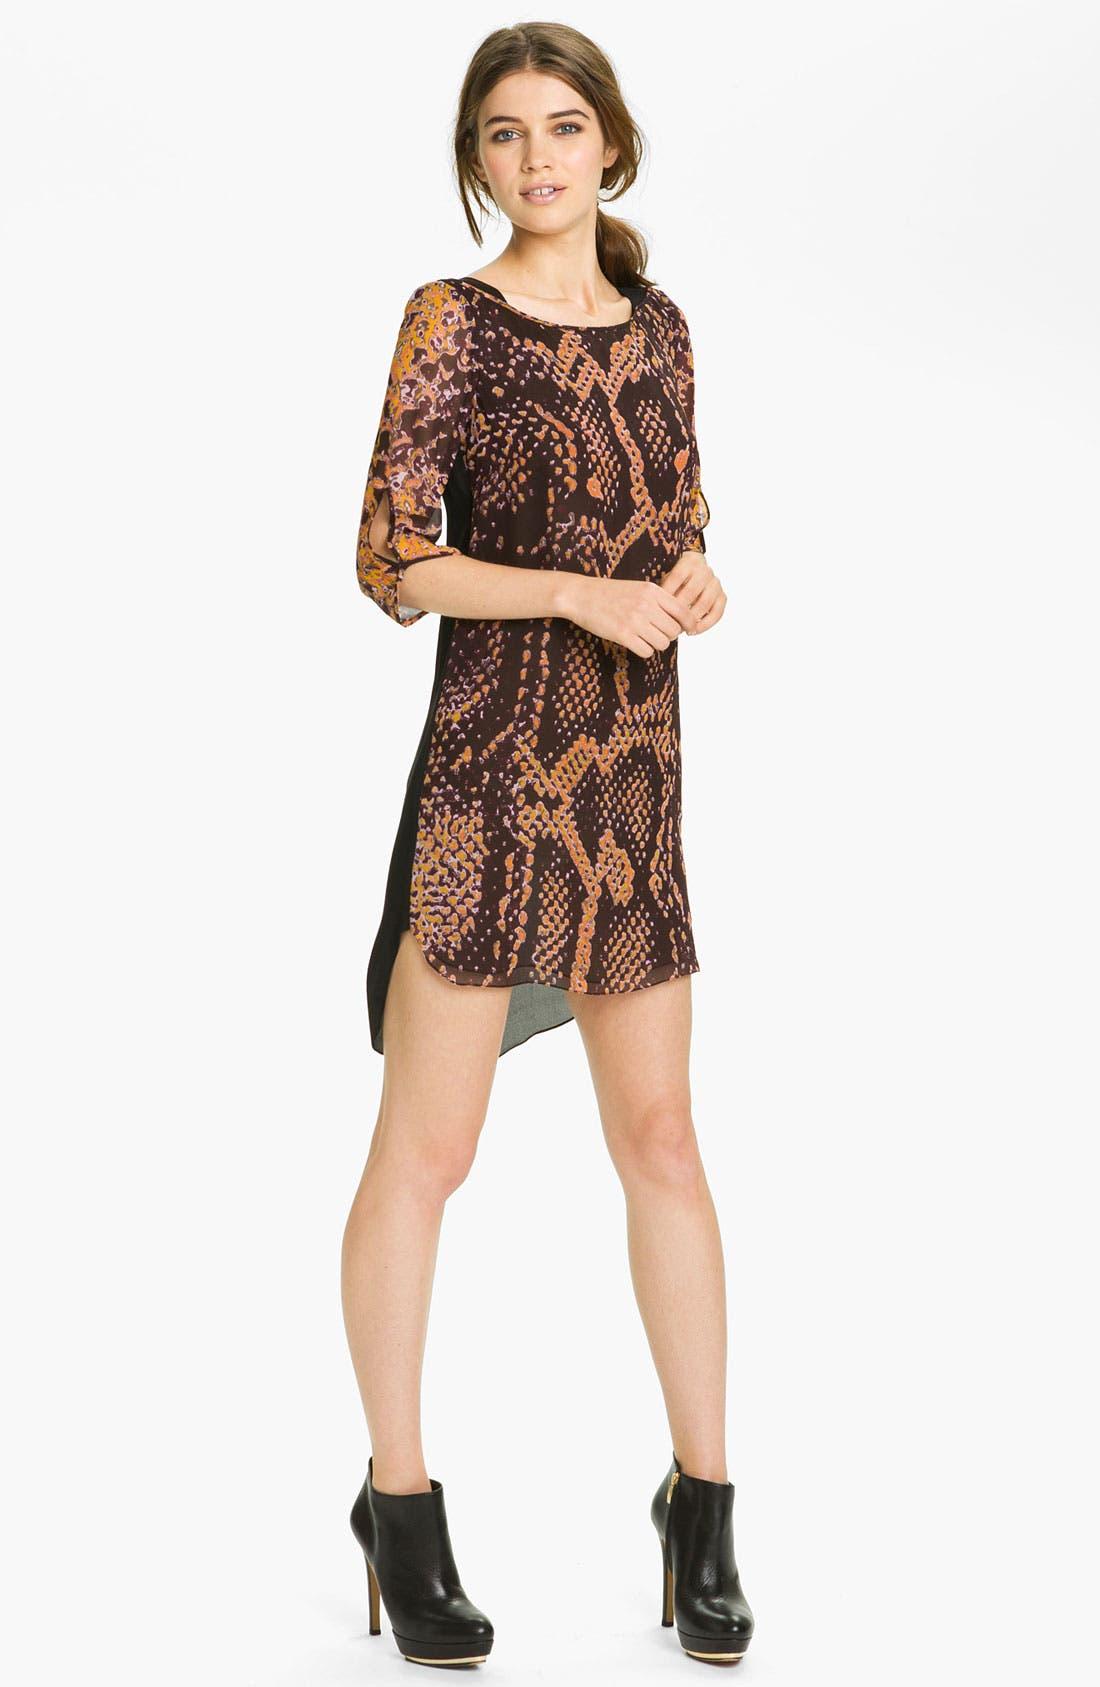 Main Image - Rebecca Minkoff 'Wednesday' Snake Print Dress